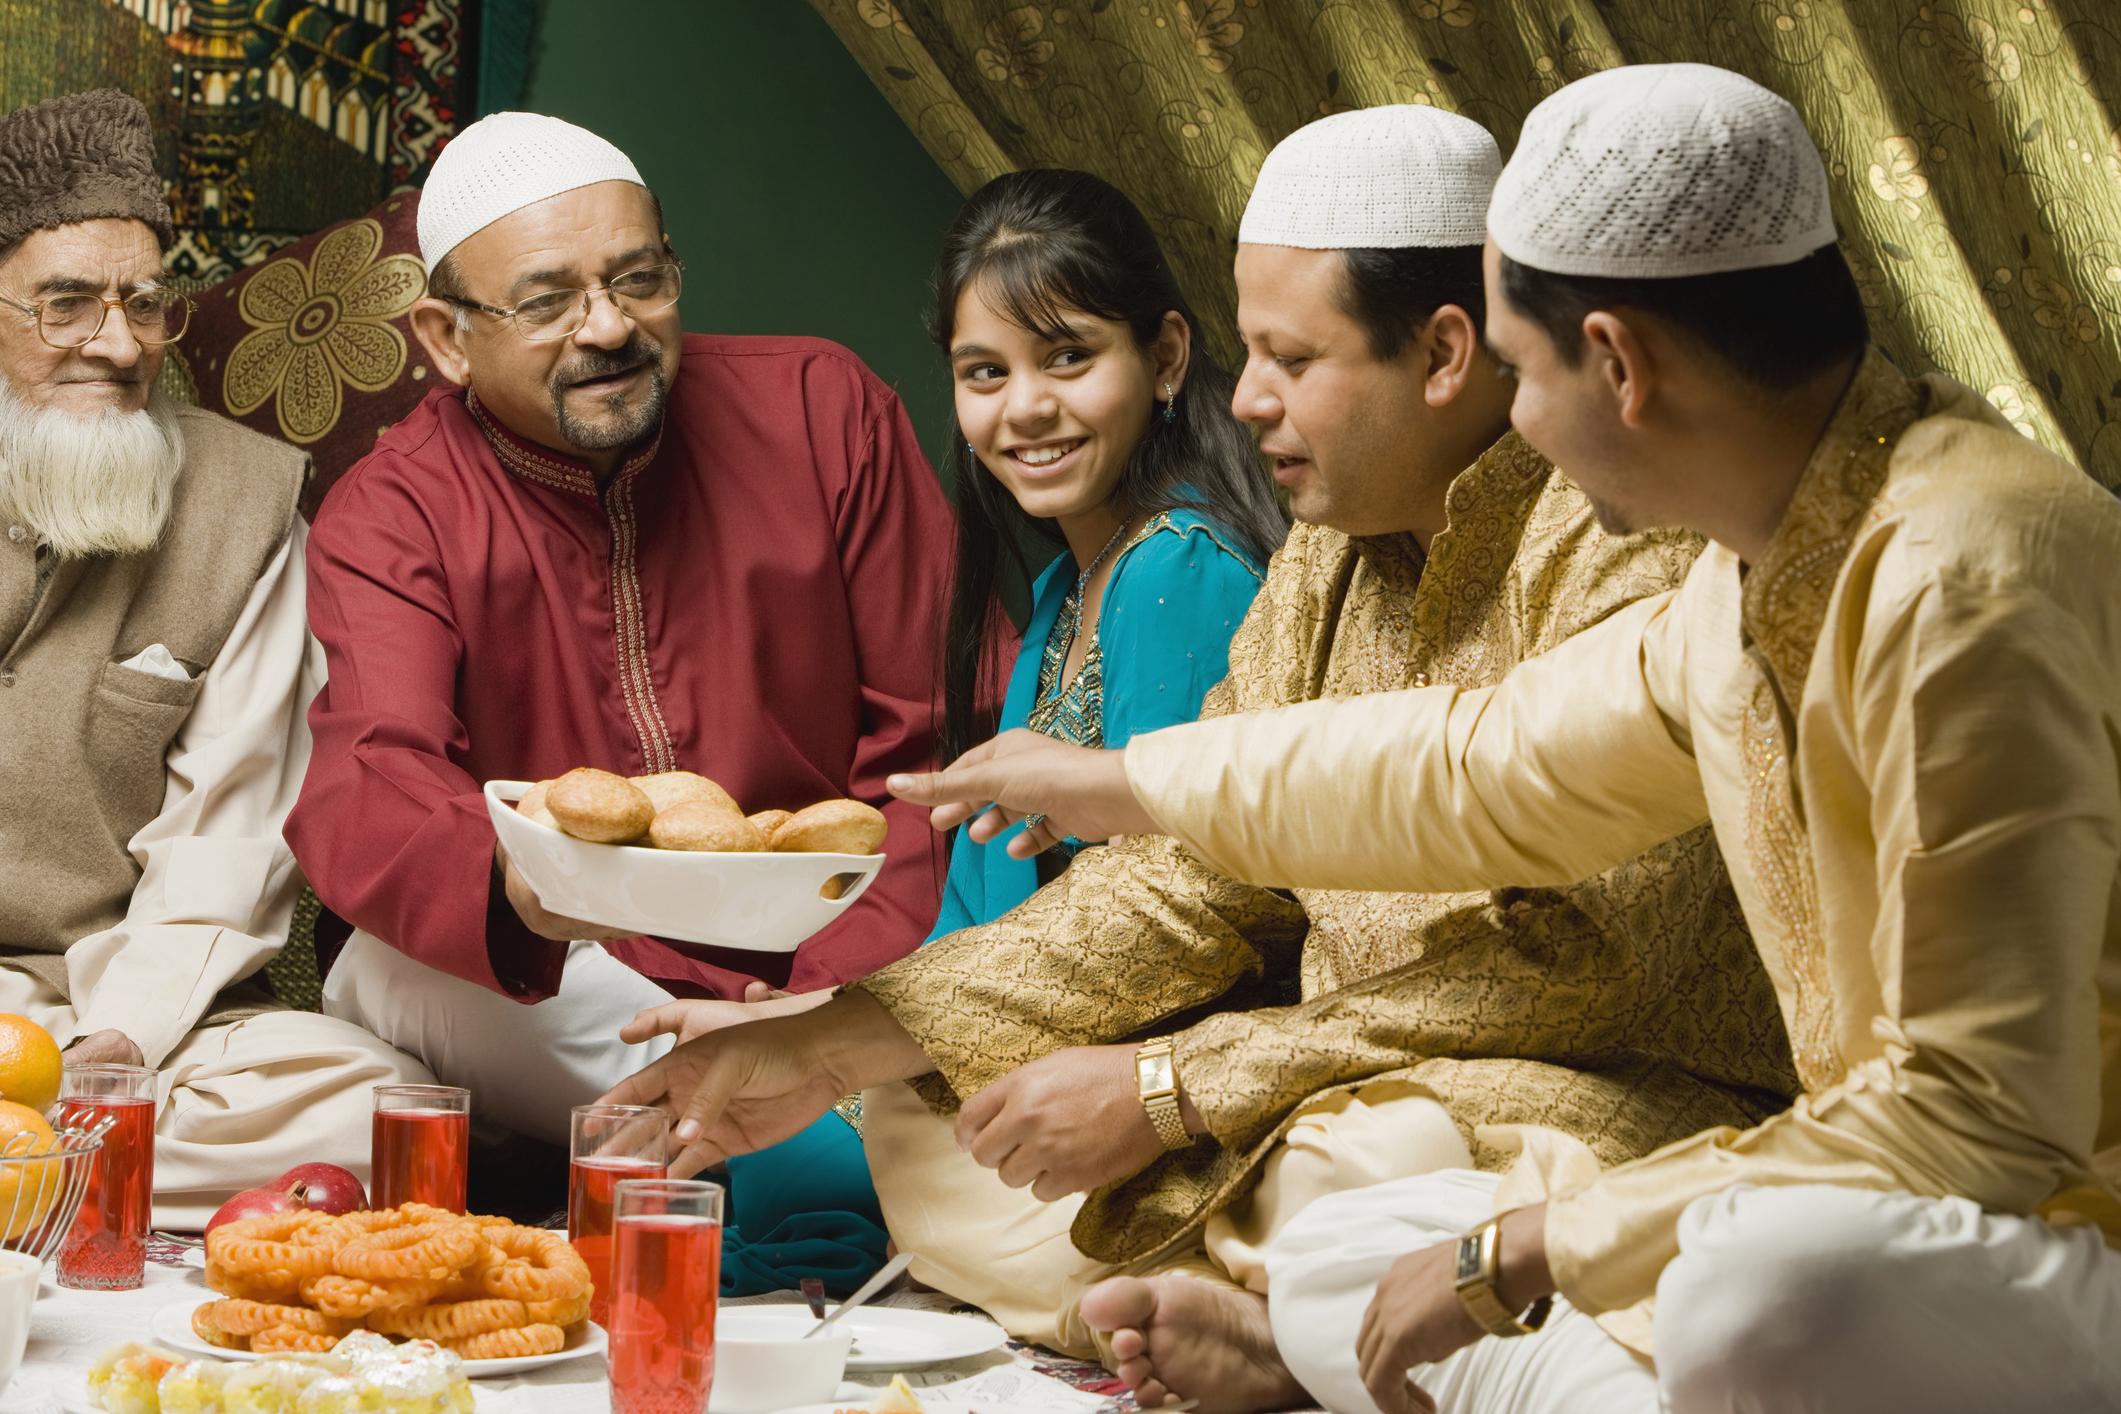 Eid Mubarak! Here's 7 reasons to love Eid ul Adha